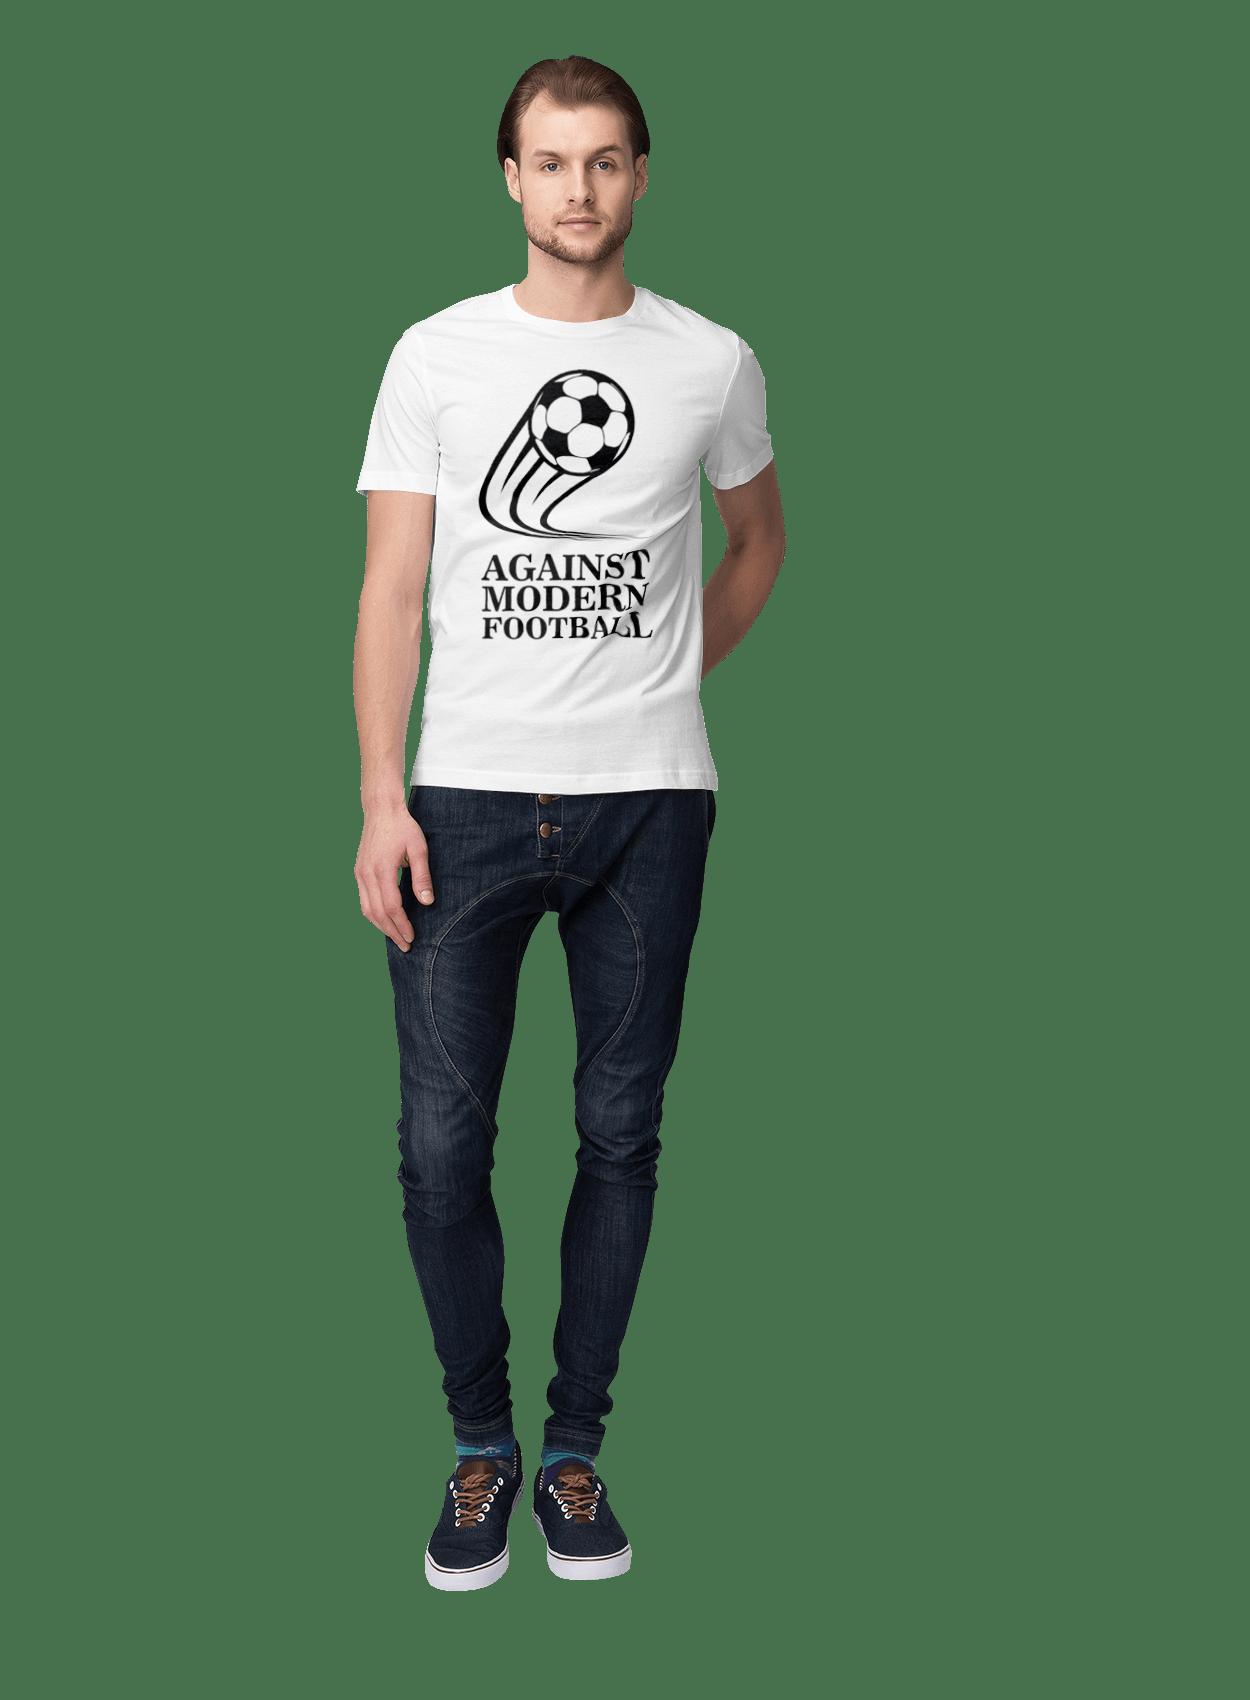 Модерн футбол